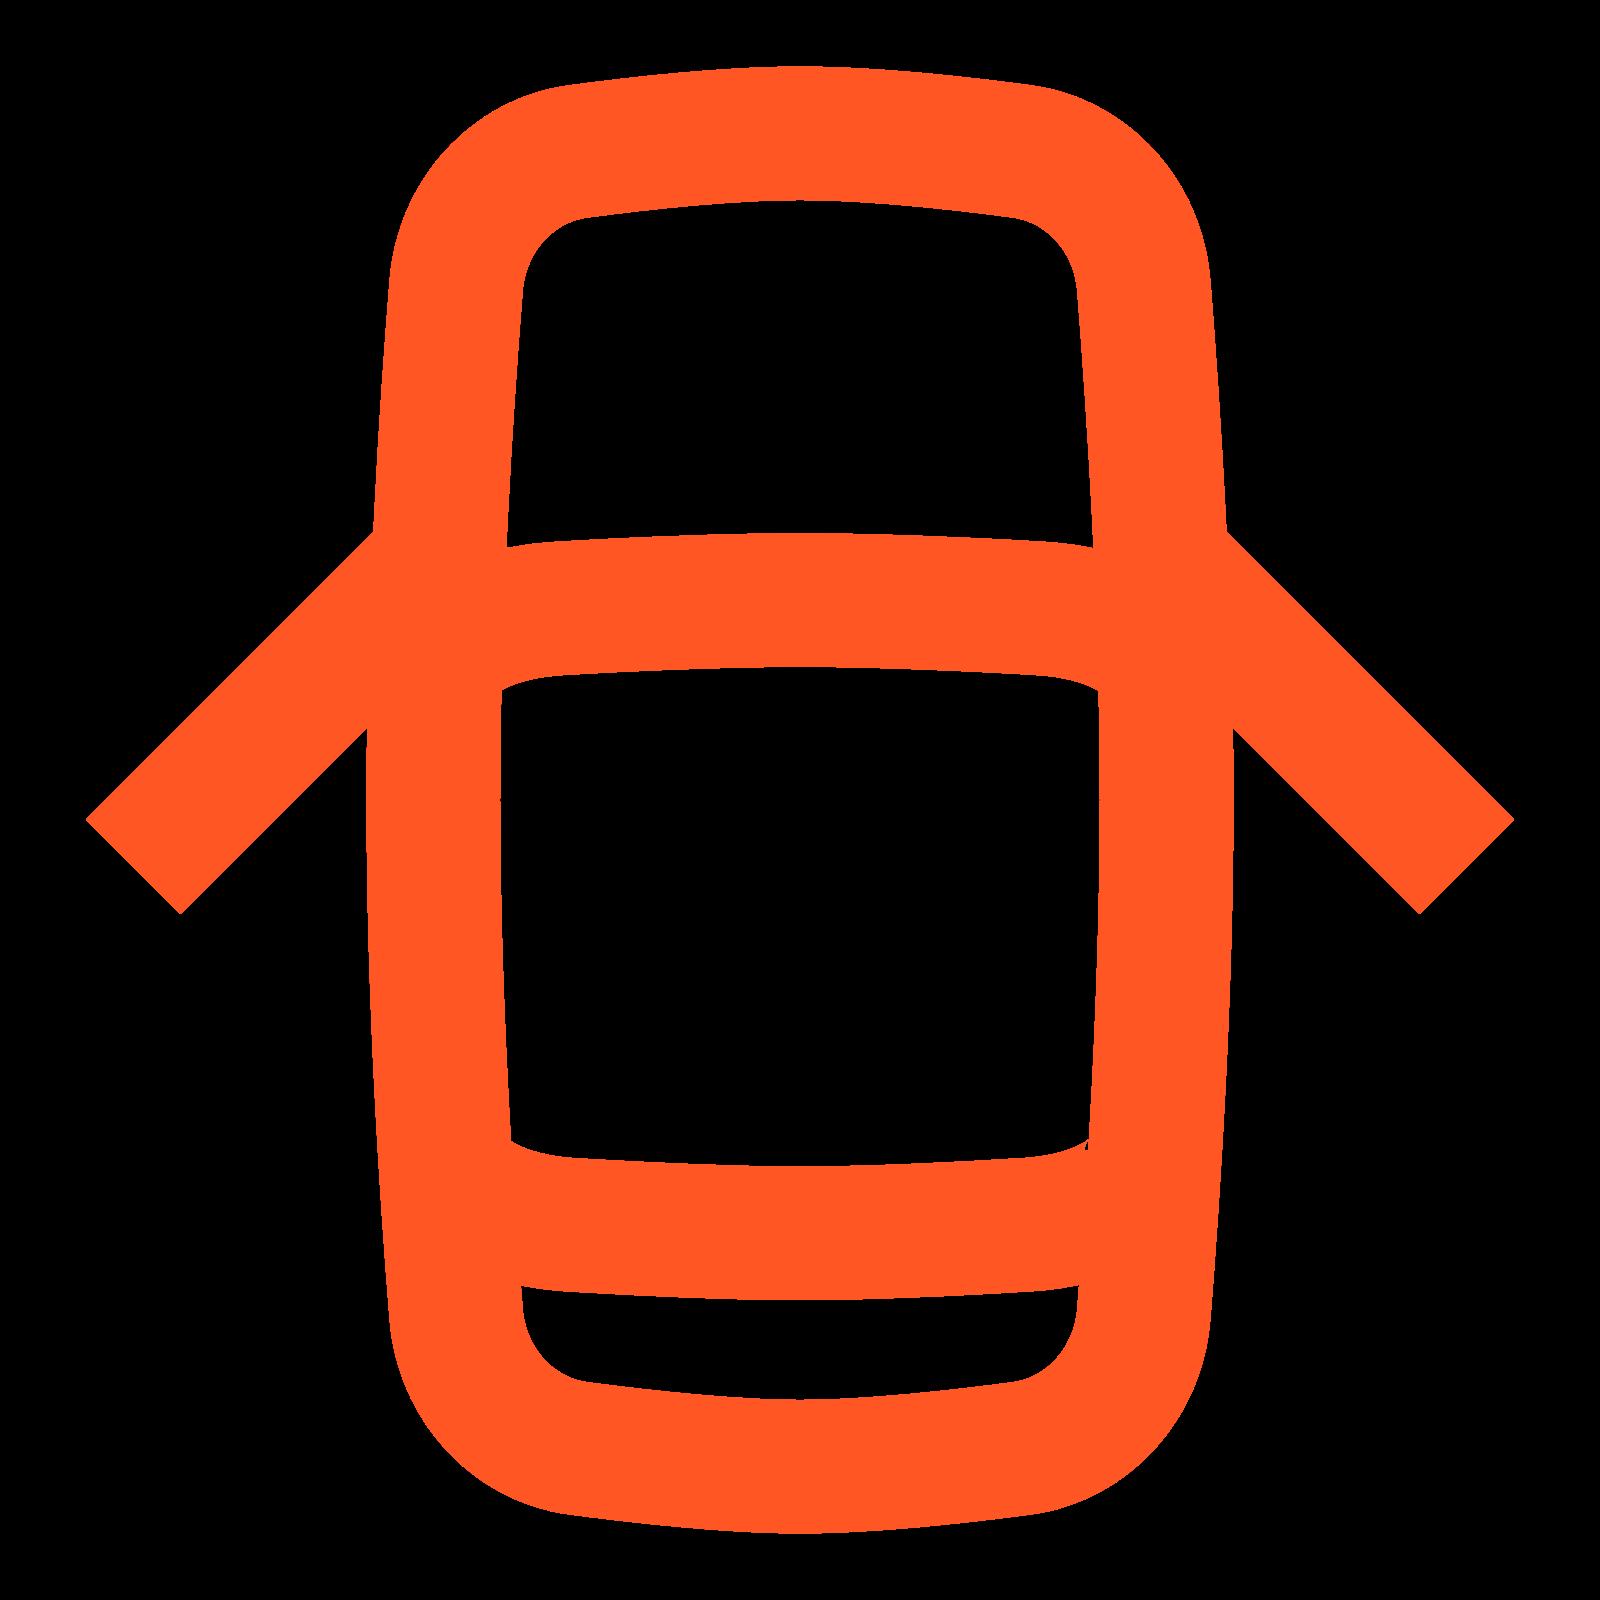 Uchylone drzwi icon